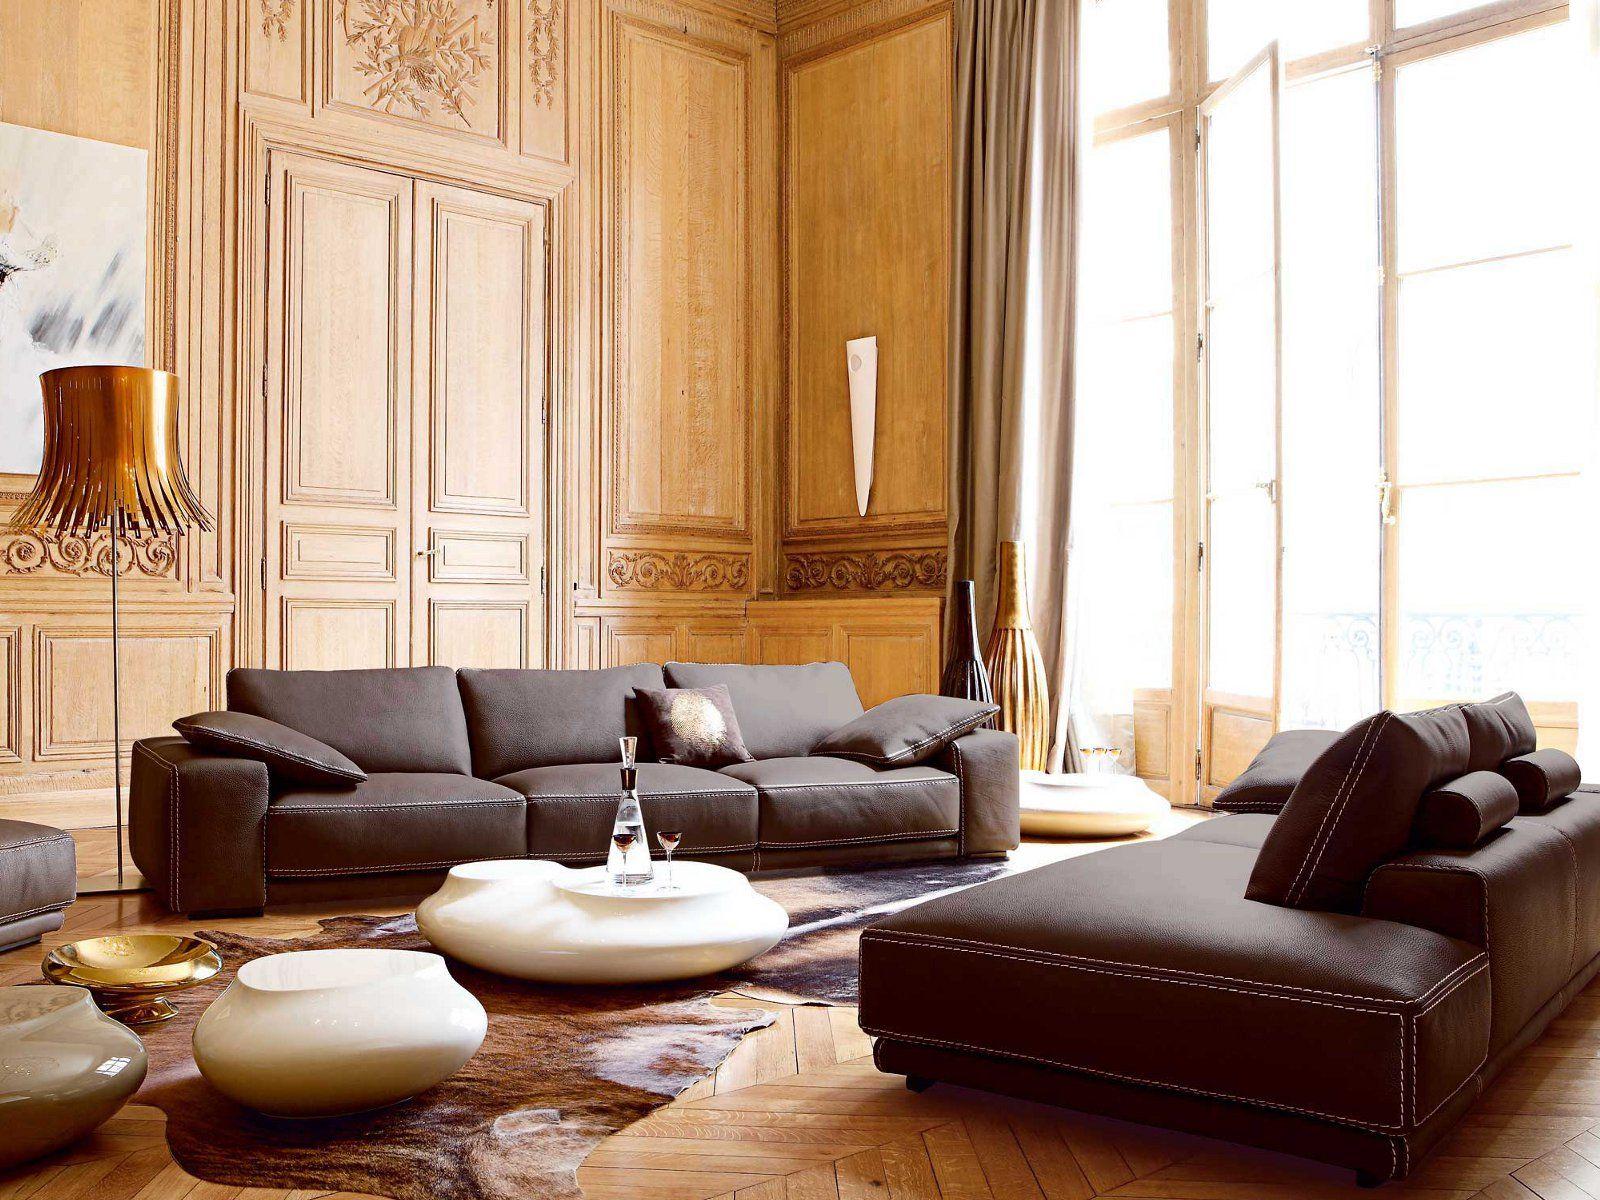 Roche Bobois Sofas Catalogo: Modern Living Room Design By Amazing Roche Bobois